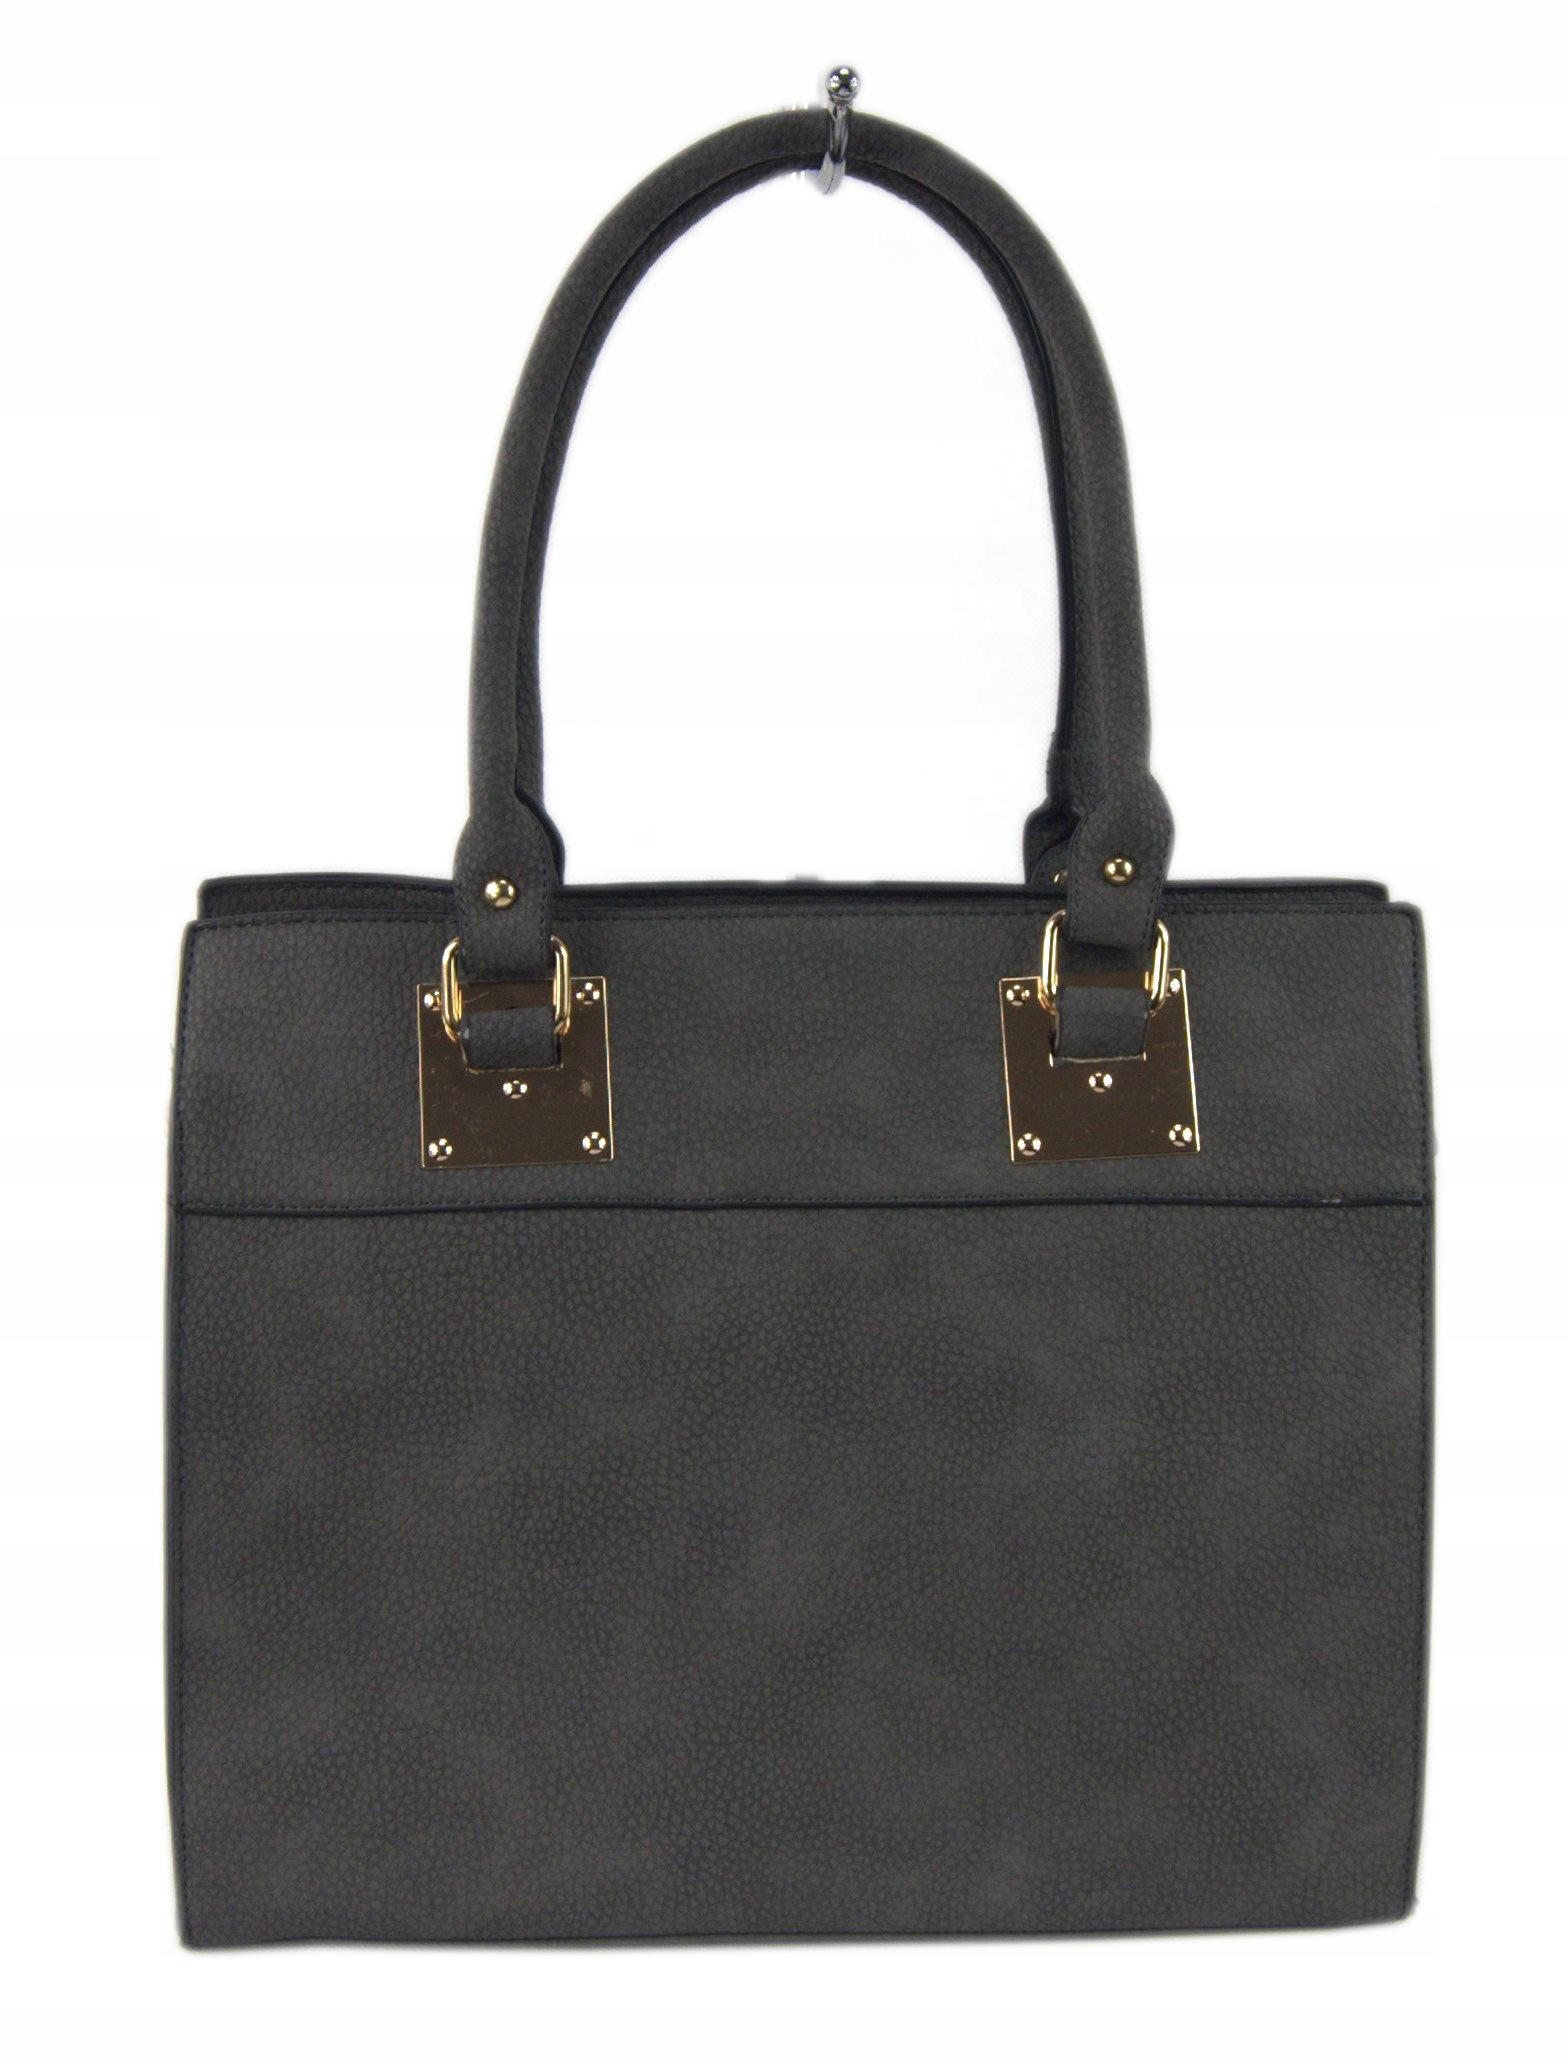 8ab3470853017 Torebka damska stylowa shopper bag SZARA BIZNESOWA - 7446339380 ...